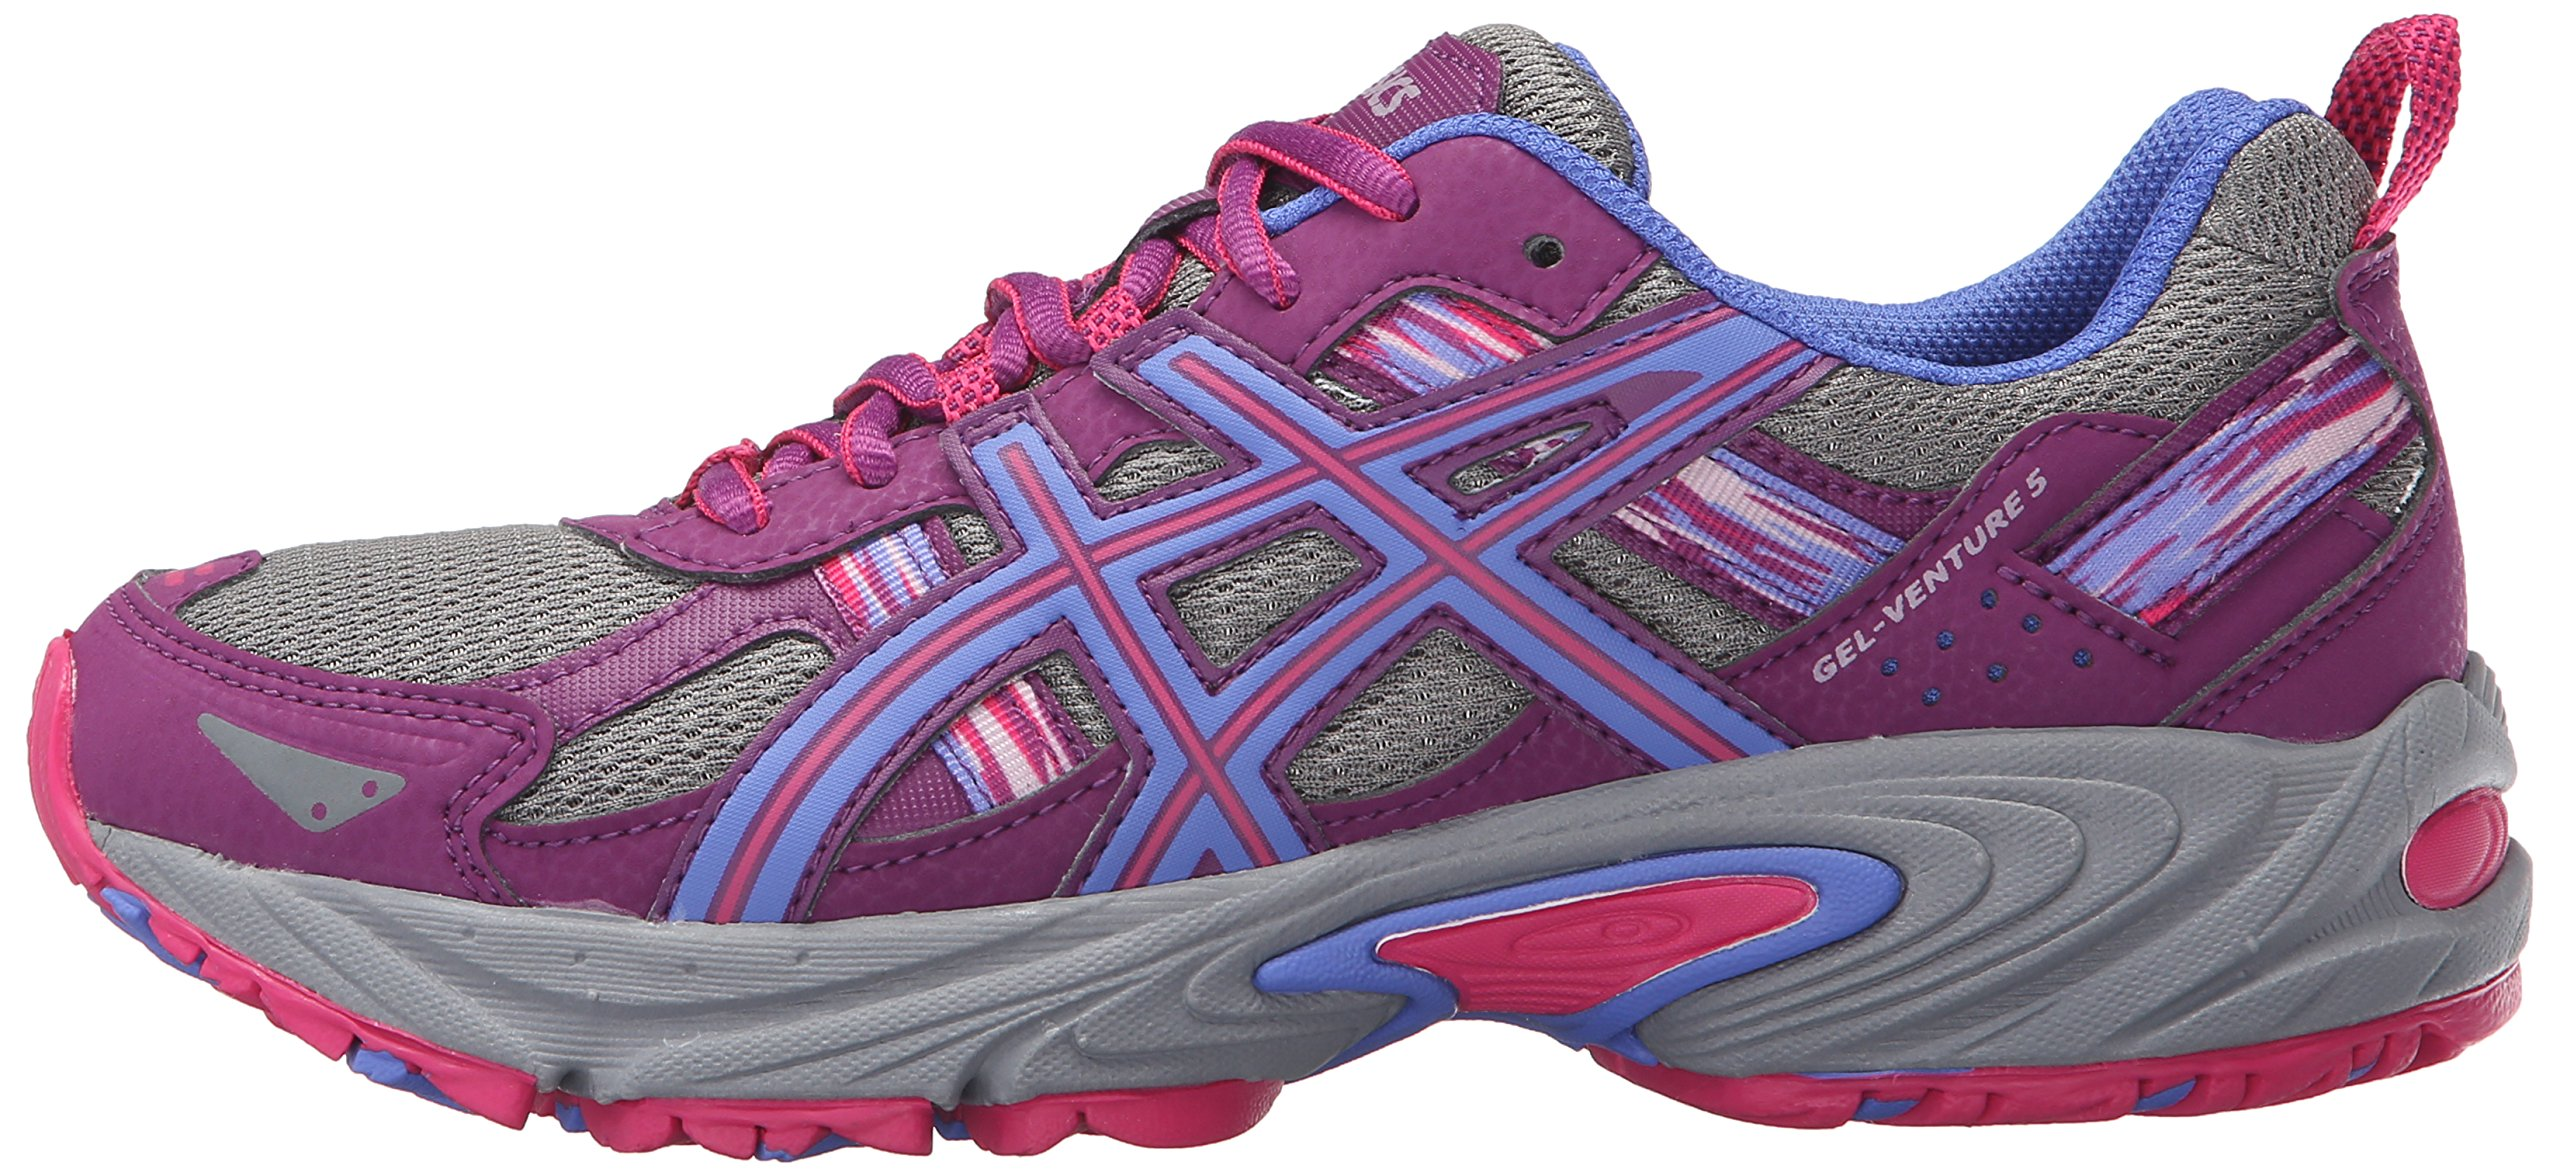 ASICS Women's Gel-Venture 5 Trail Runner, Phlox/Sport Pink/Aluminum, 6 M US by ASICS (Image #5)